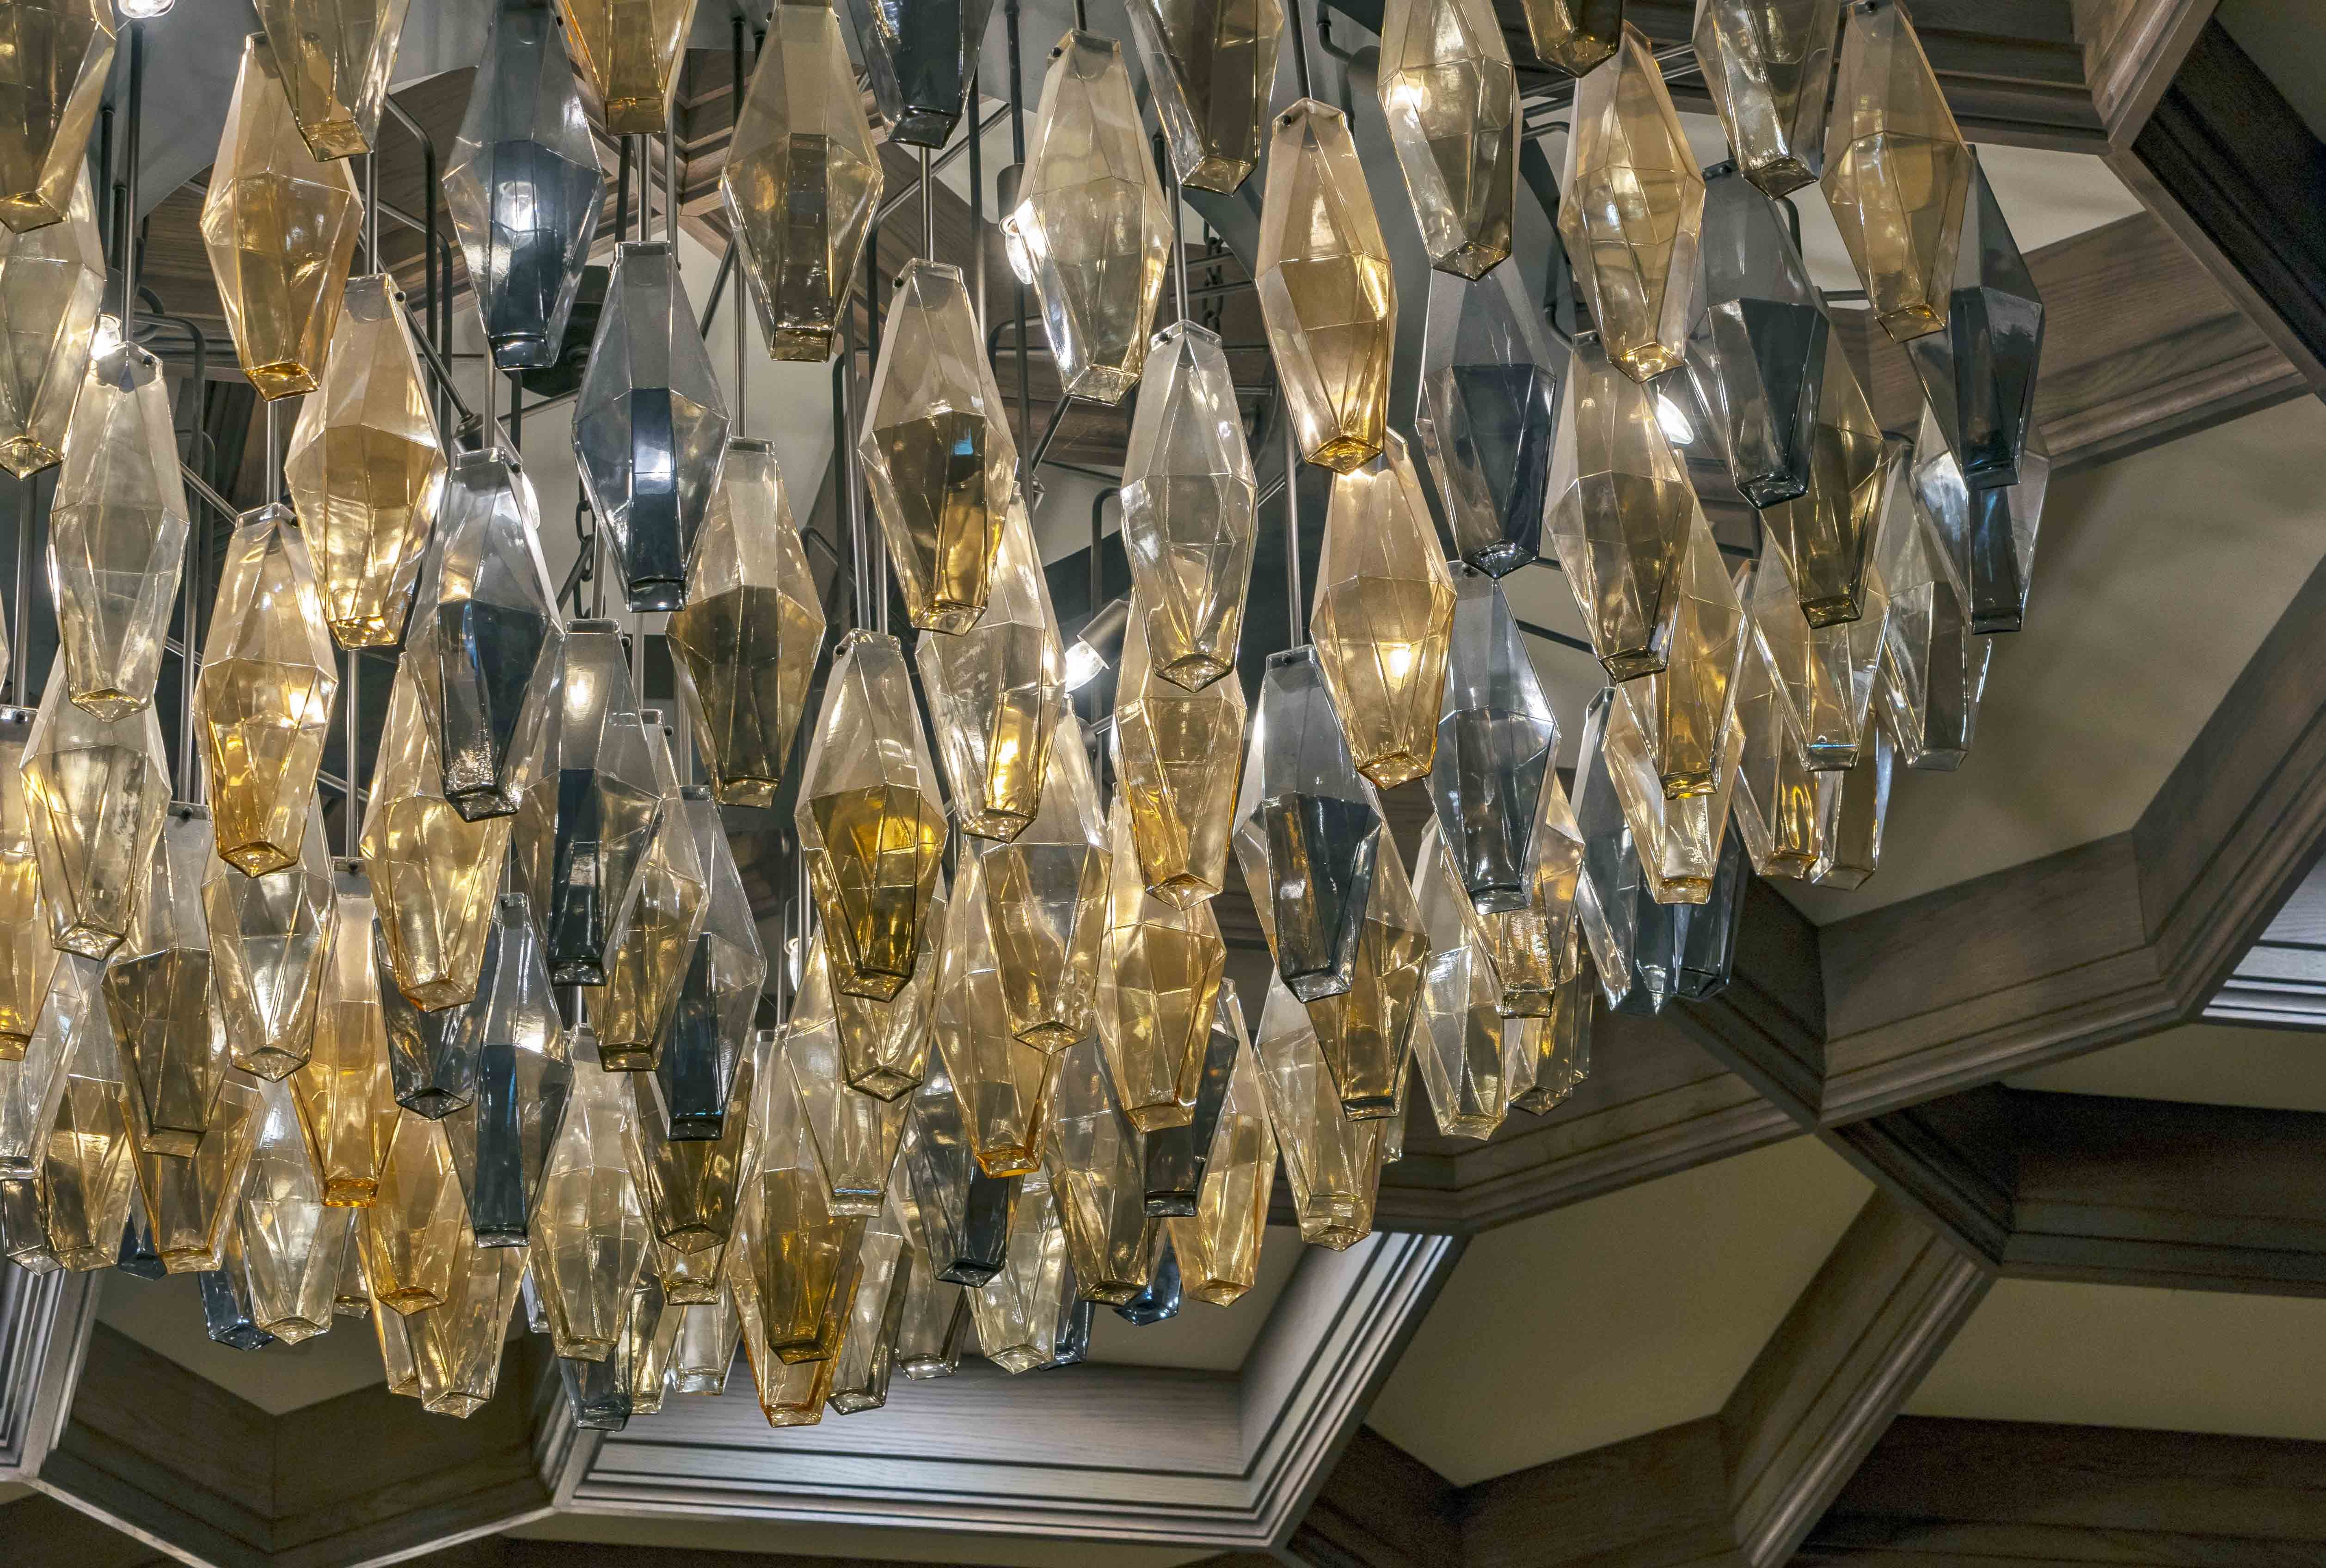 Custom Chandelier Hotel Lighting Made By Iworks